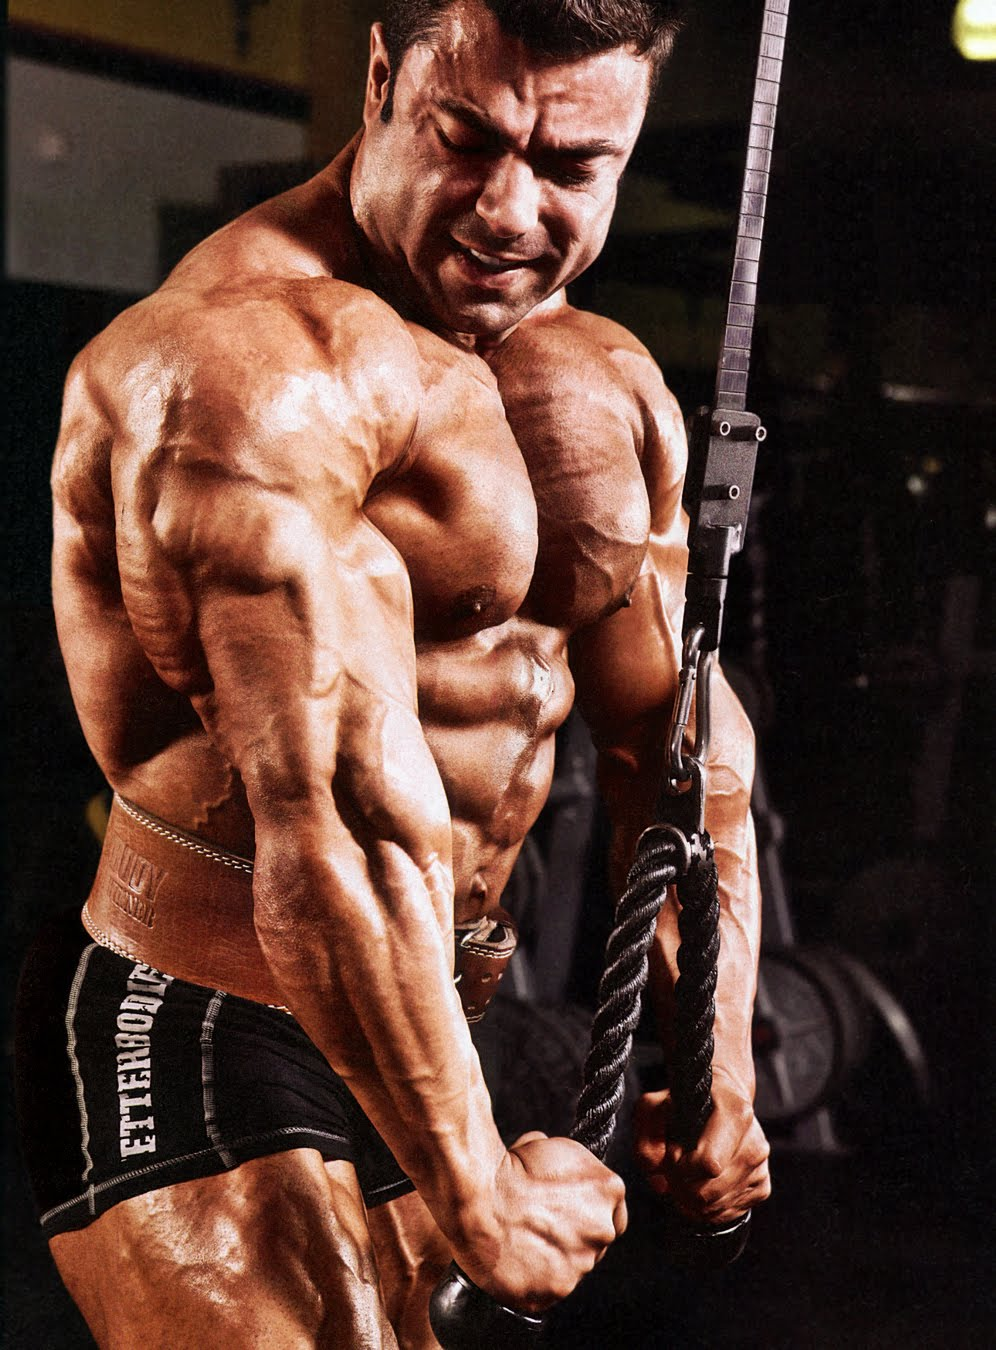 Eduardo Correa Works his Arms 2